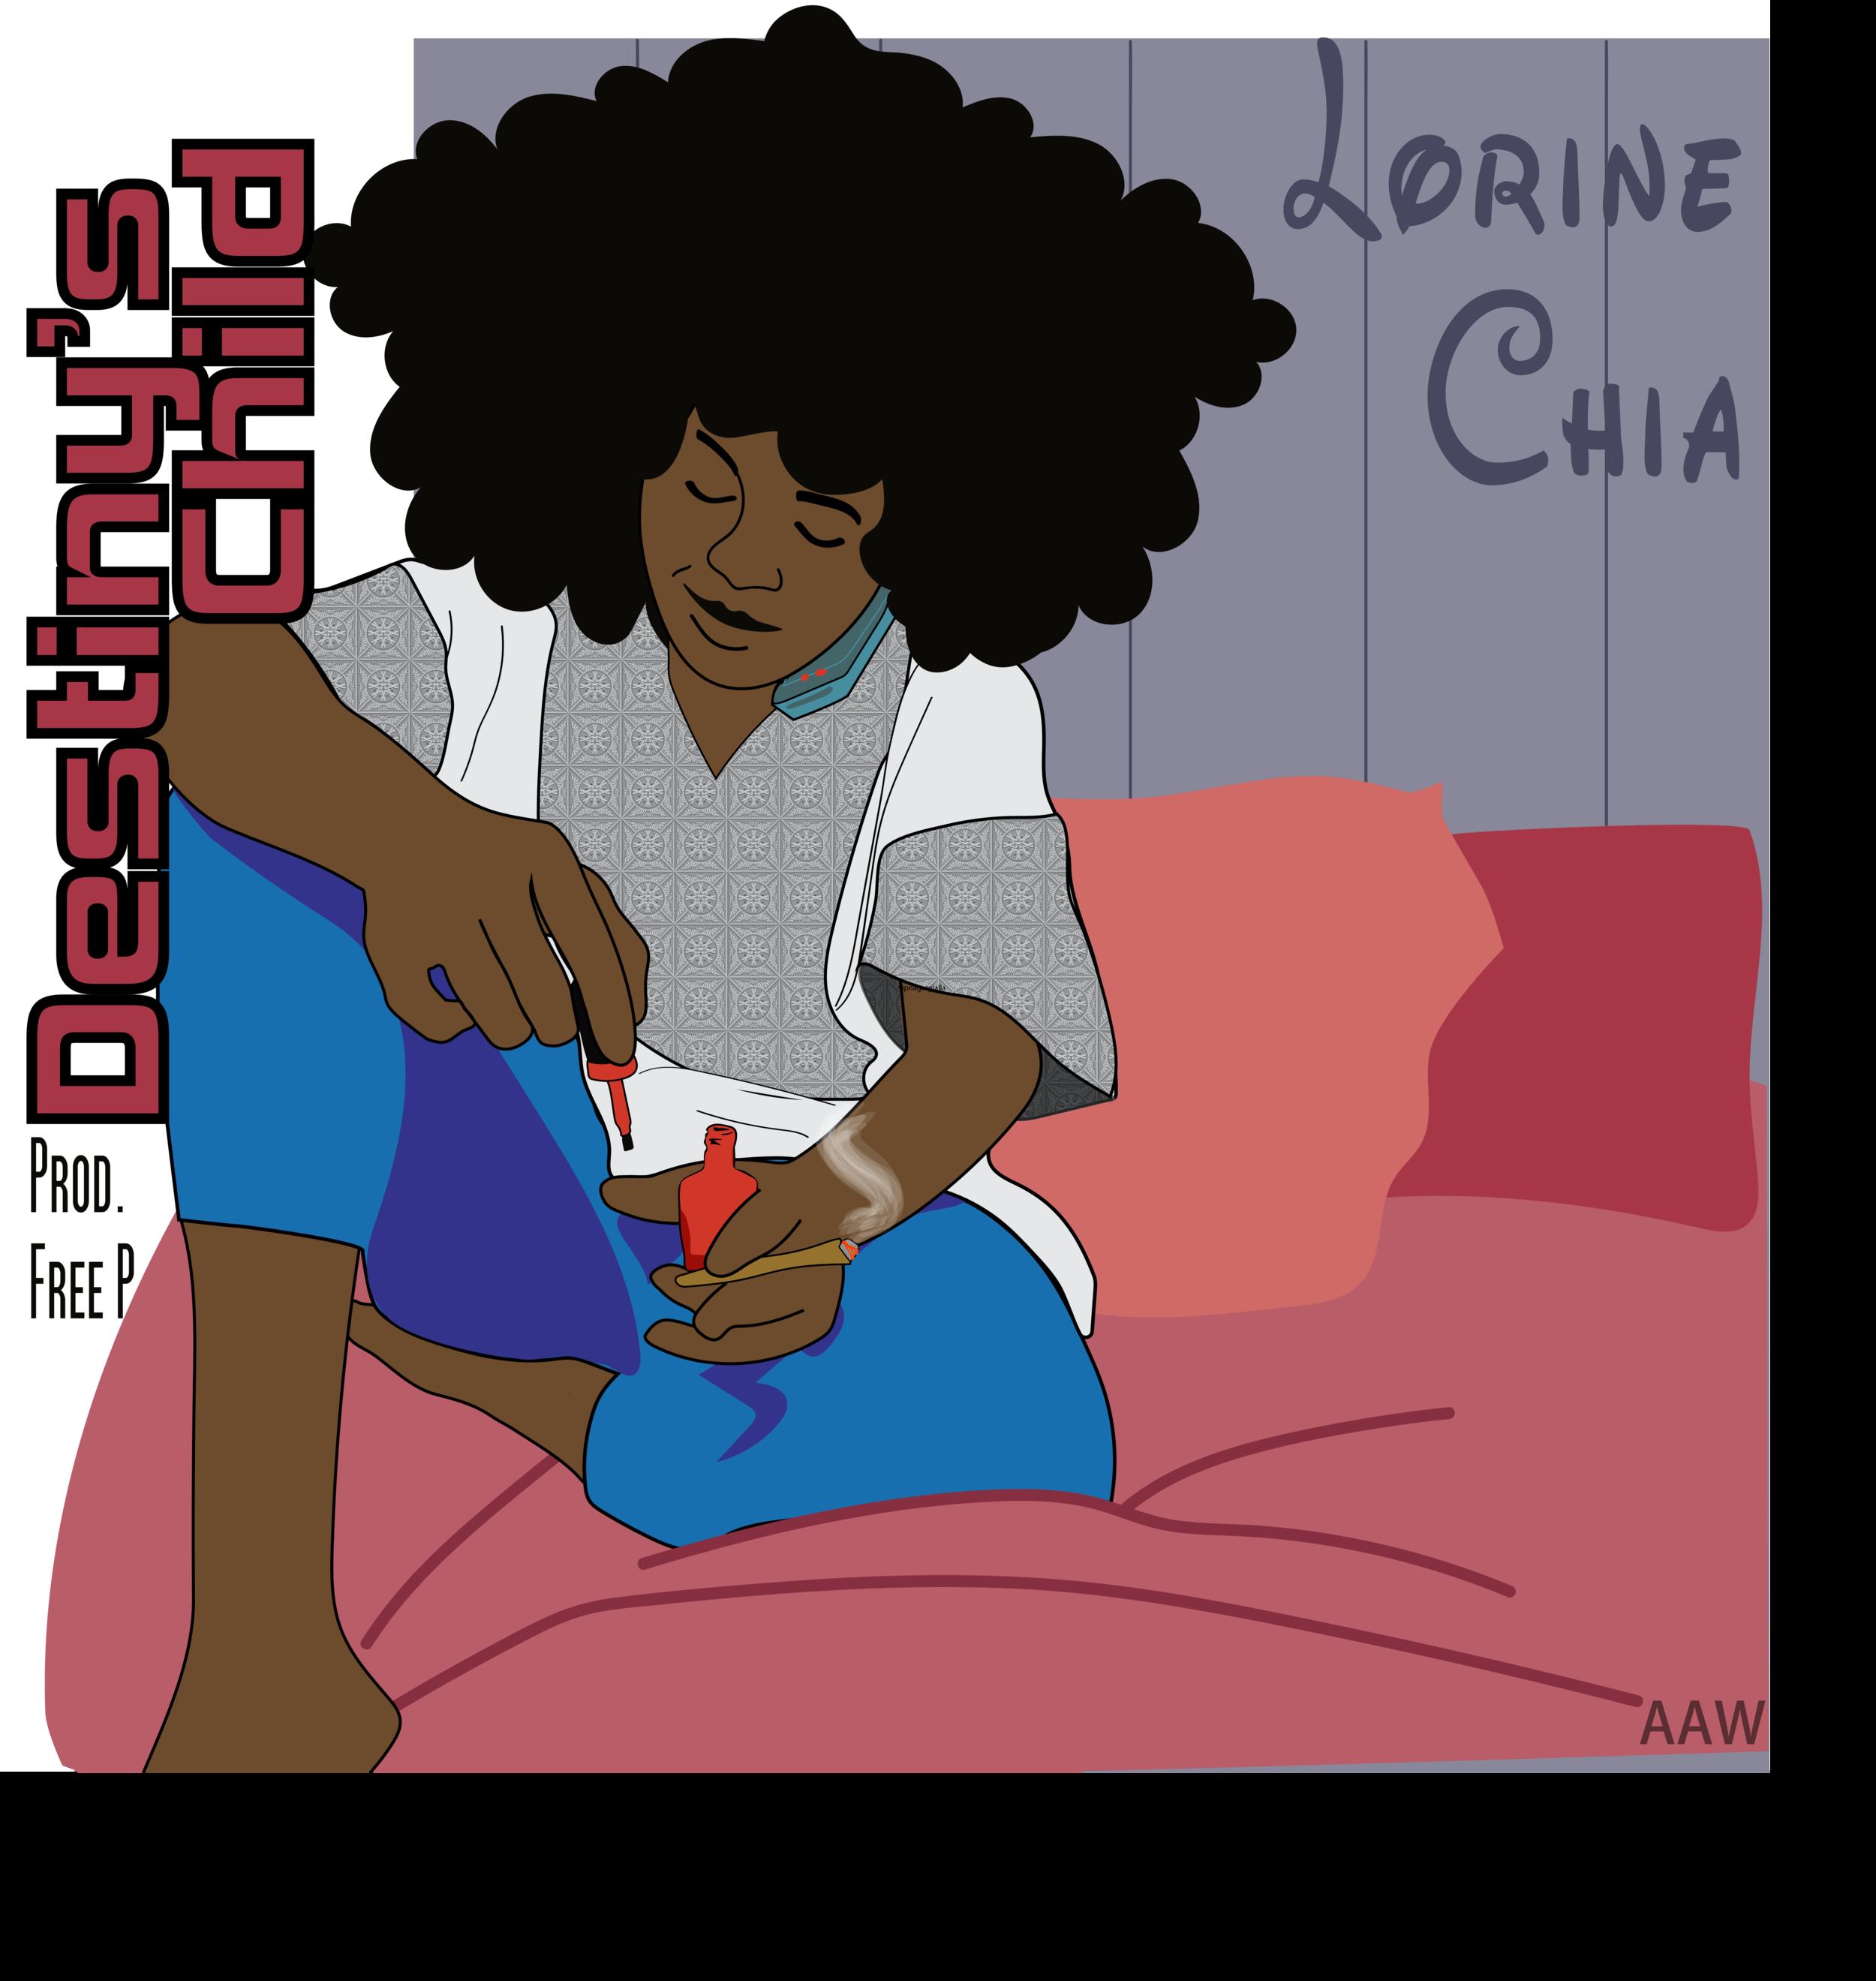 Lorine Chia Destiny Child smaller (1).png